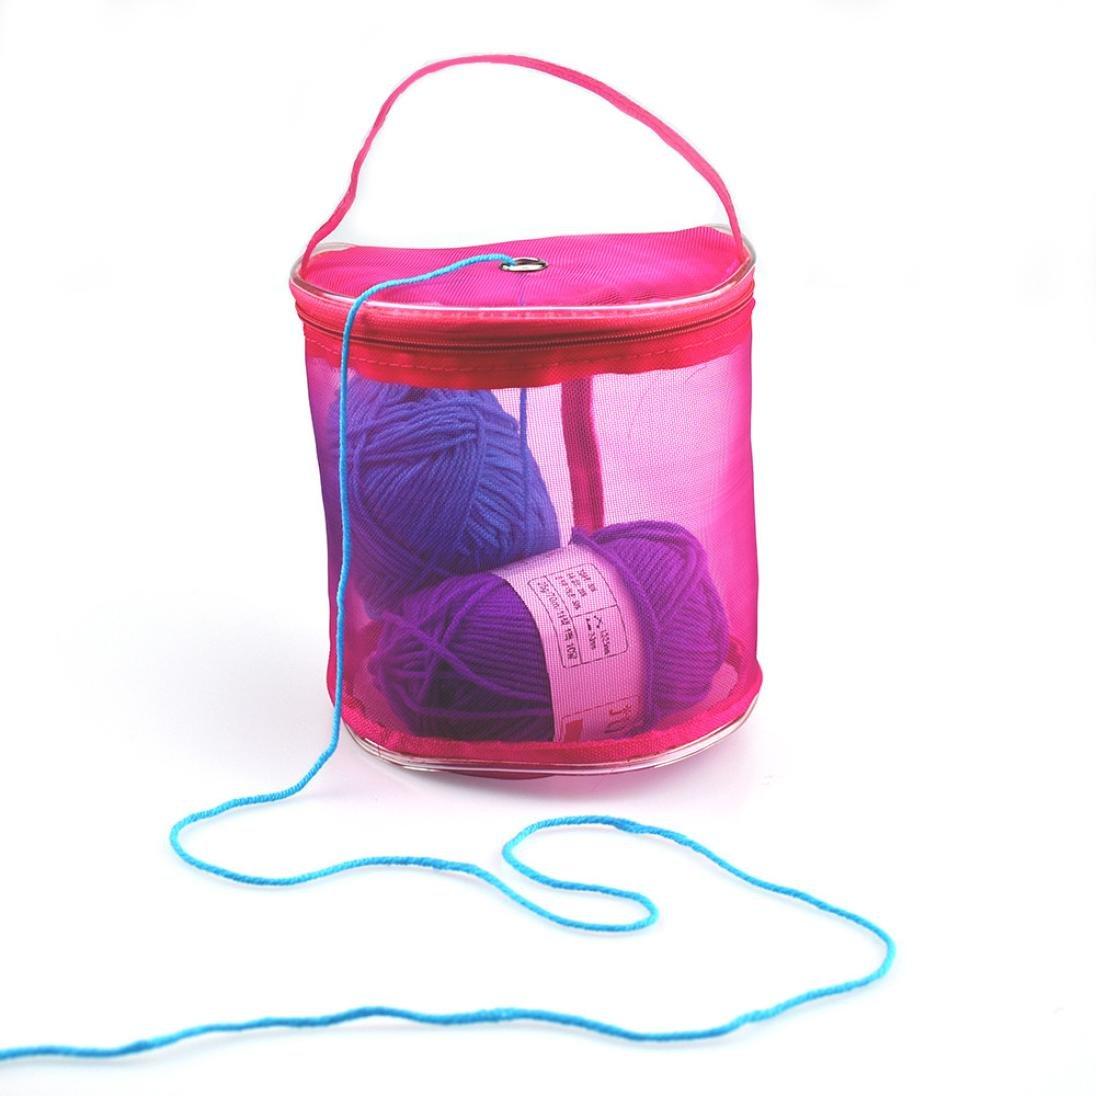 Clearance Deal! Hot Sale! Storage Bag, Fitfulvan New Mesh Bag Lightweight Portable Yarn Crochet Thread Storage Organizer Tote (Hot Pink)